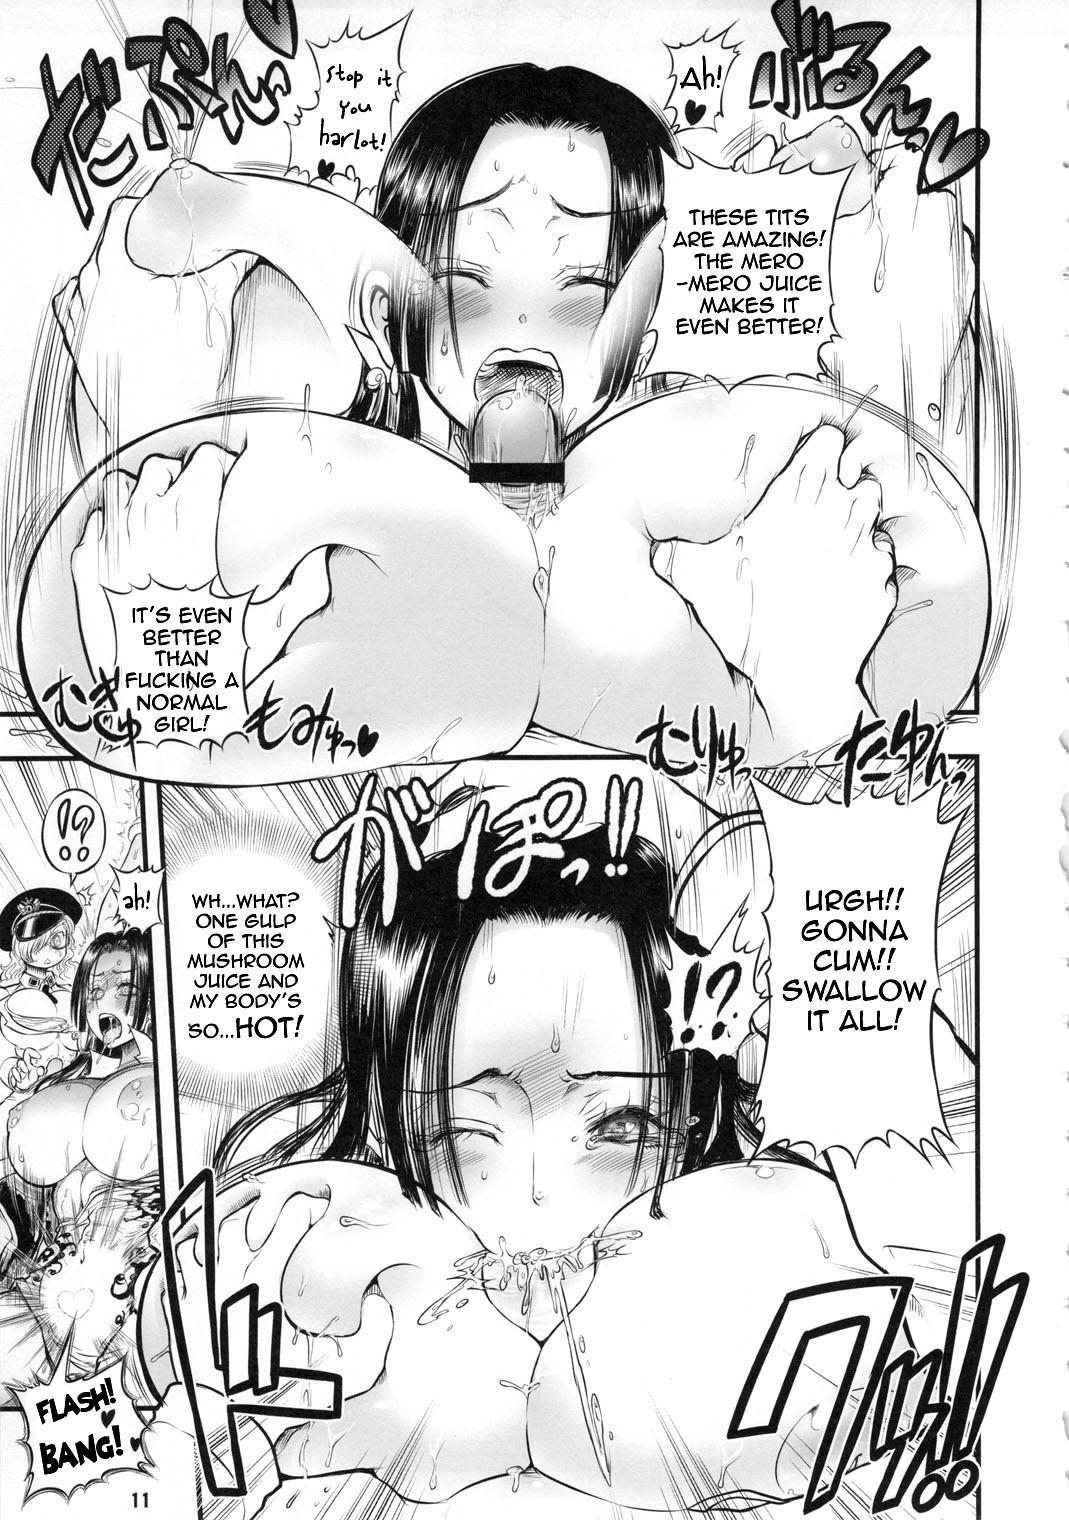 Midarezaki Kaizoku Jotei | Bloom Pirate Hooker Queen 9